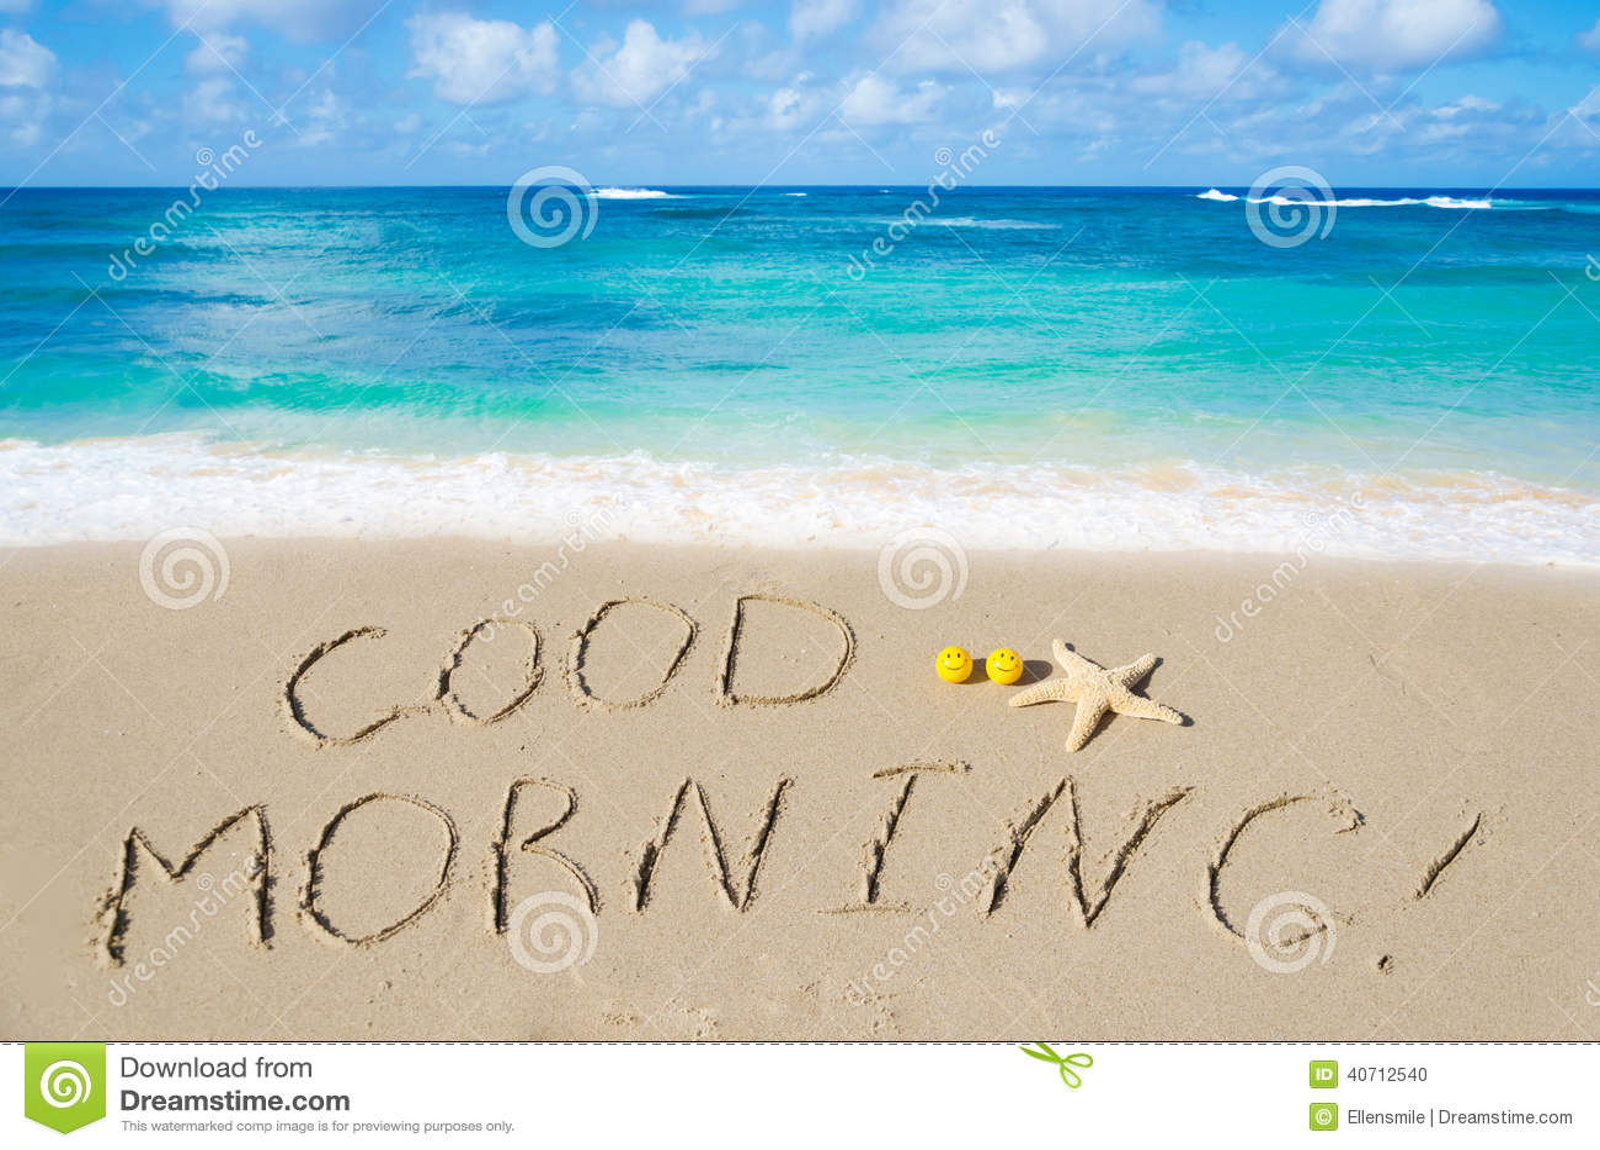 Sign Good morning on the sandy beach.